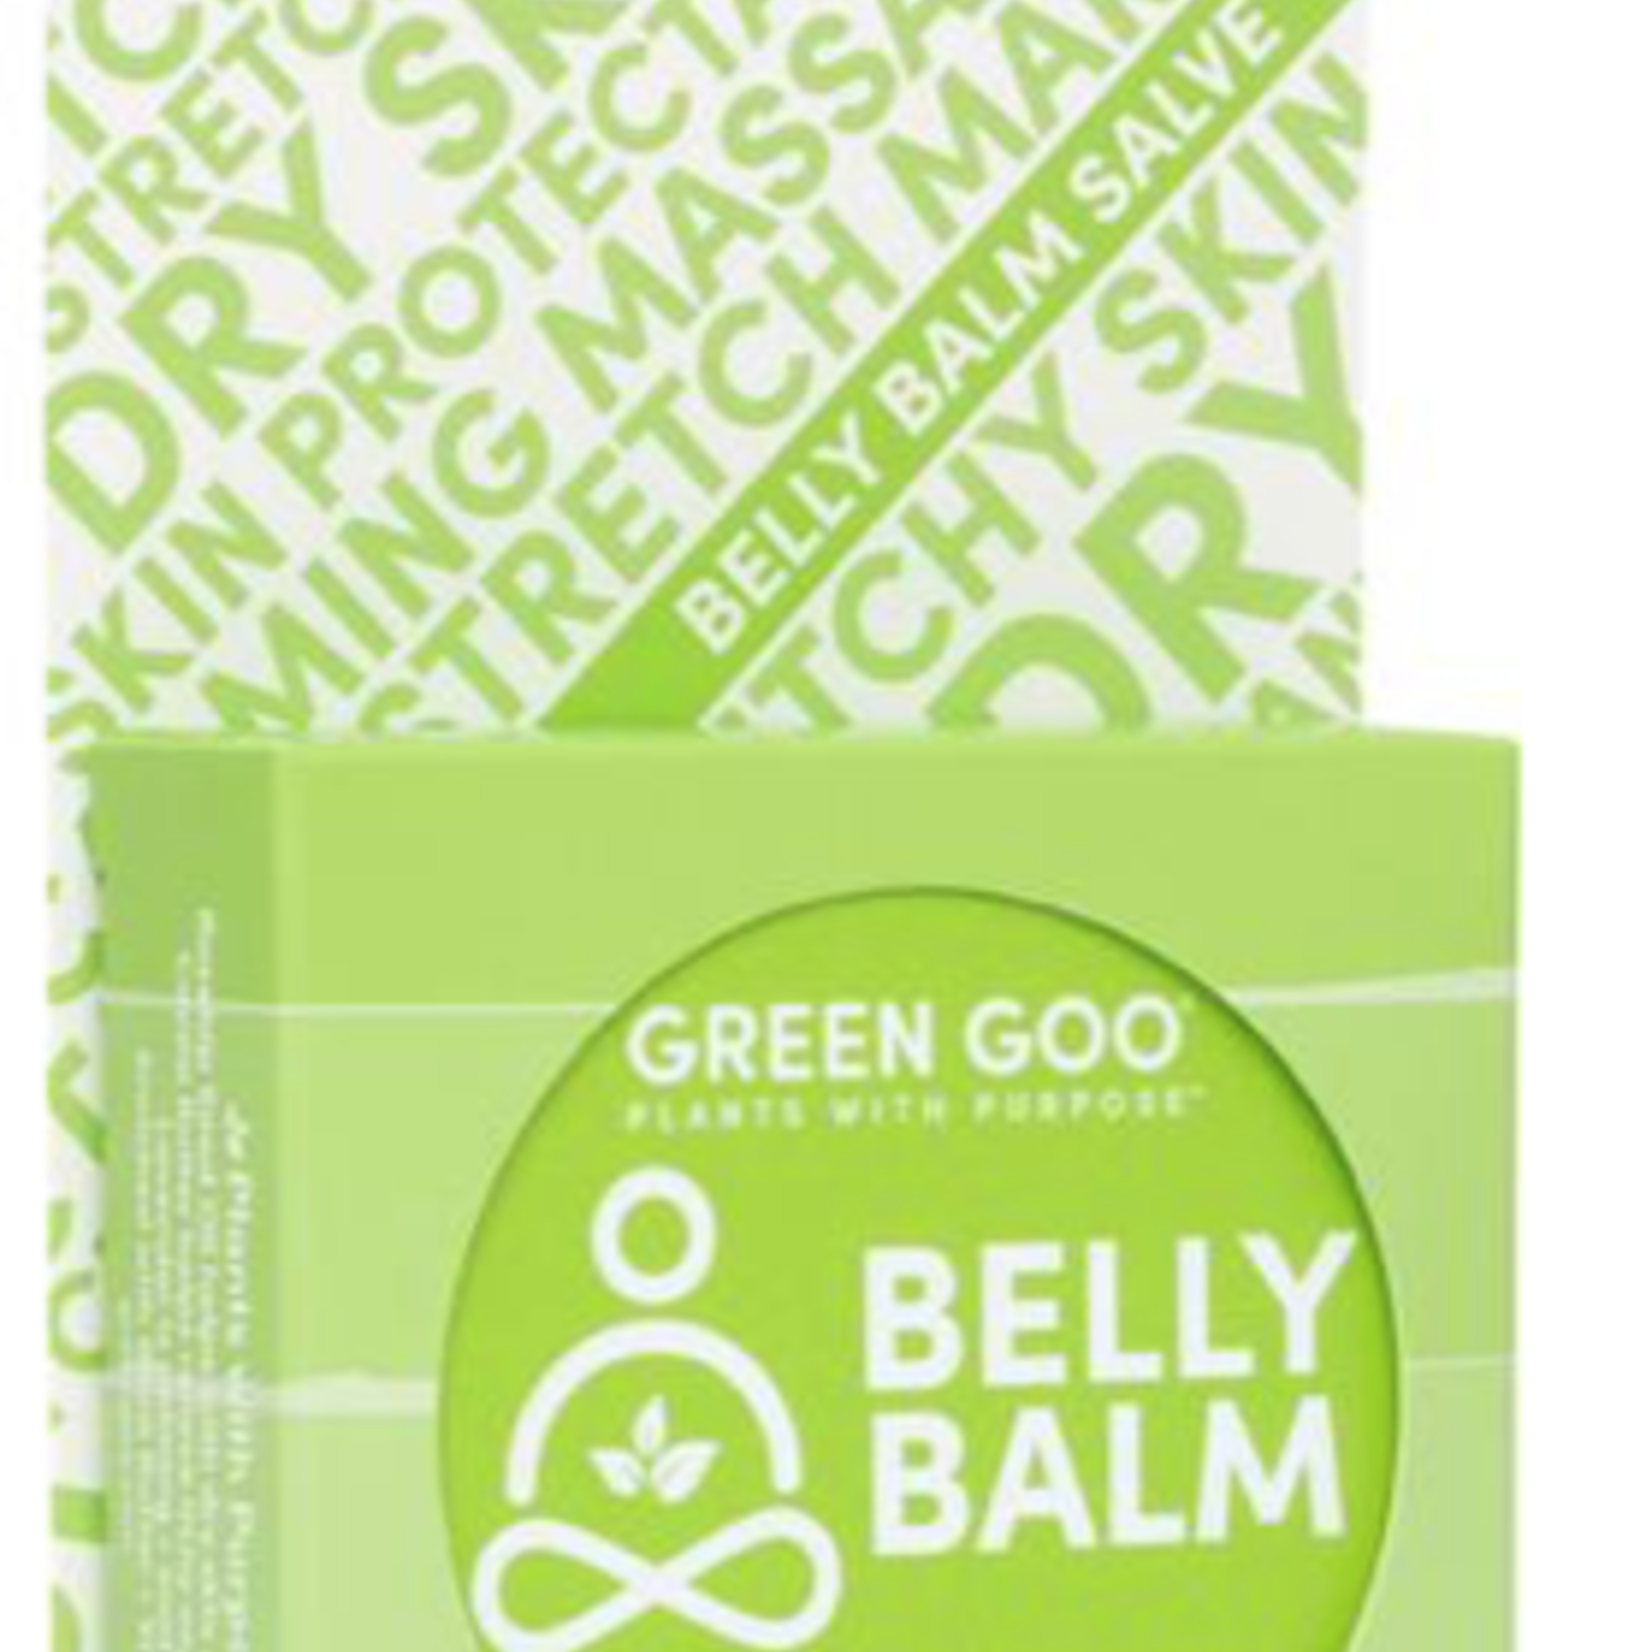 Green Goo Belly Balm